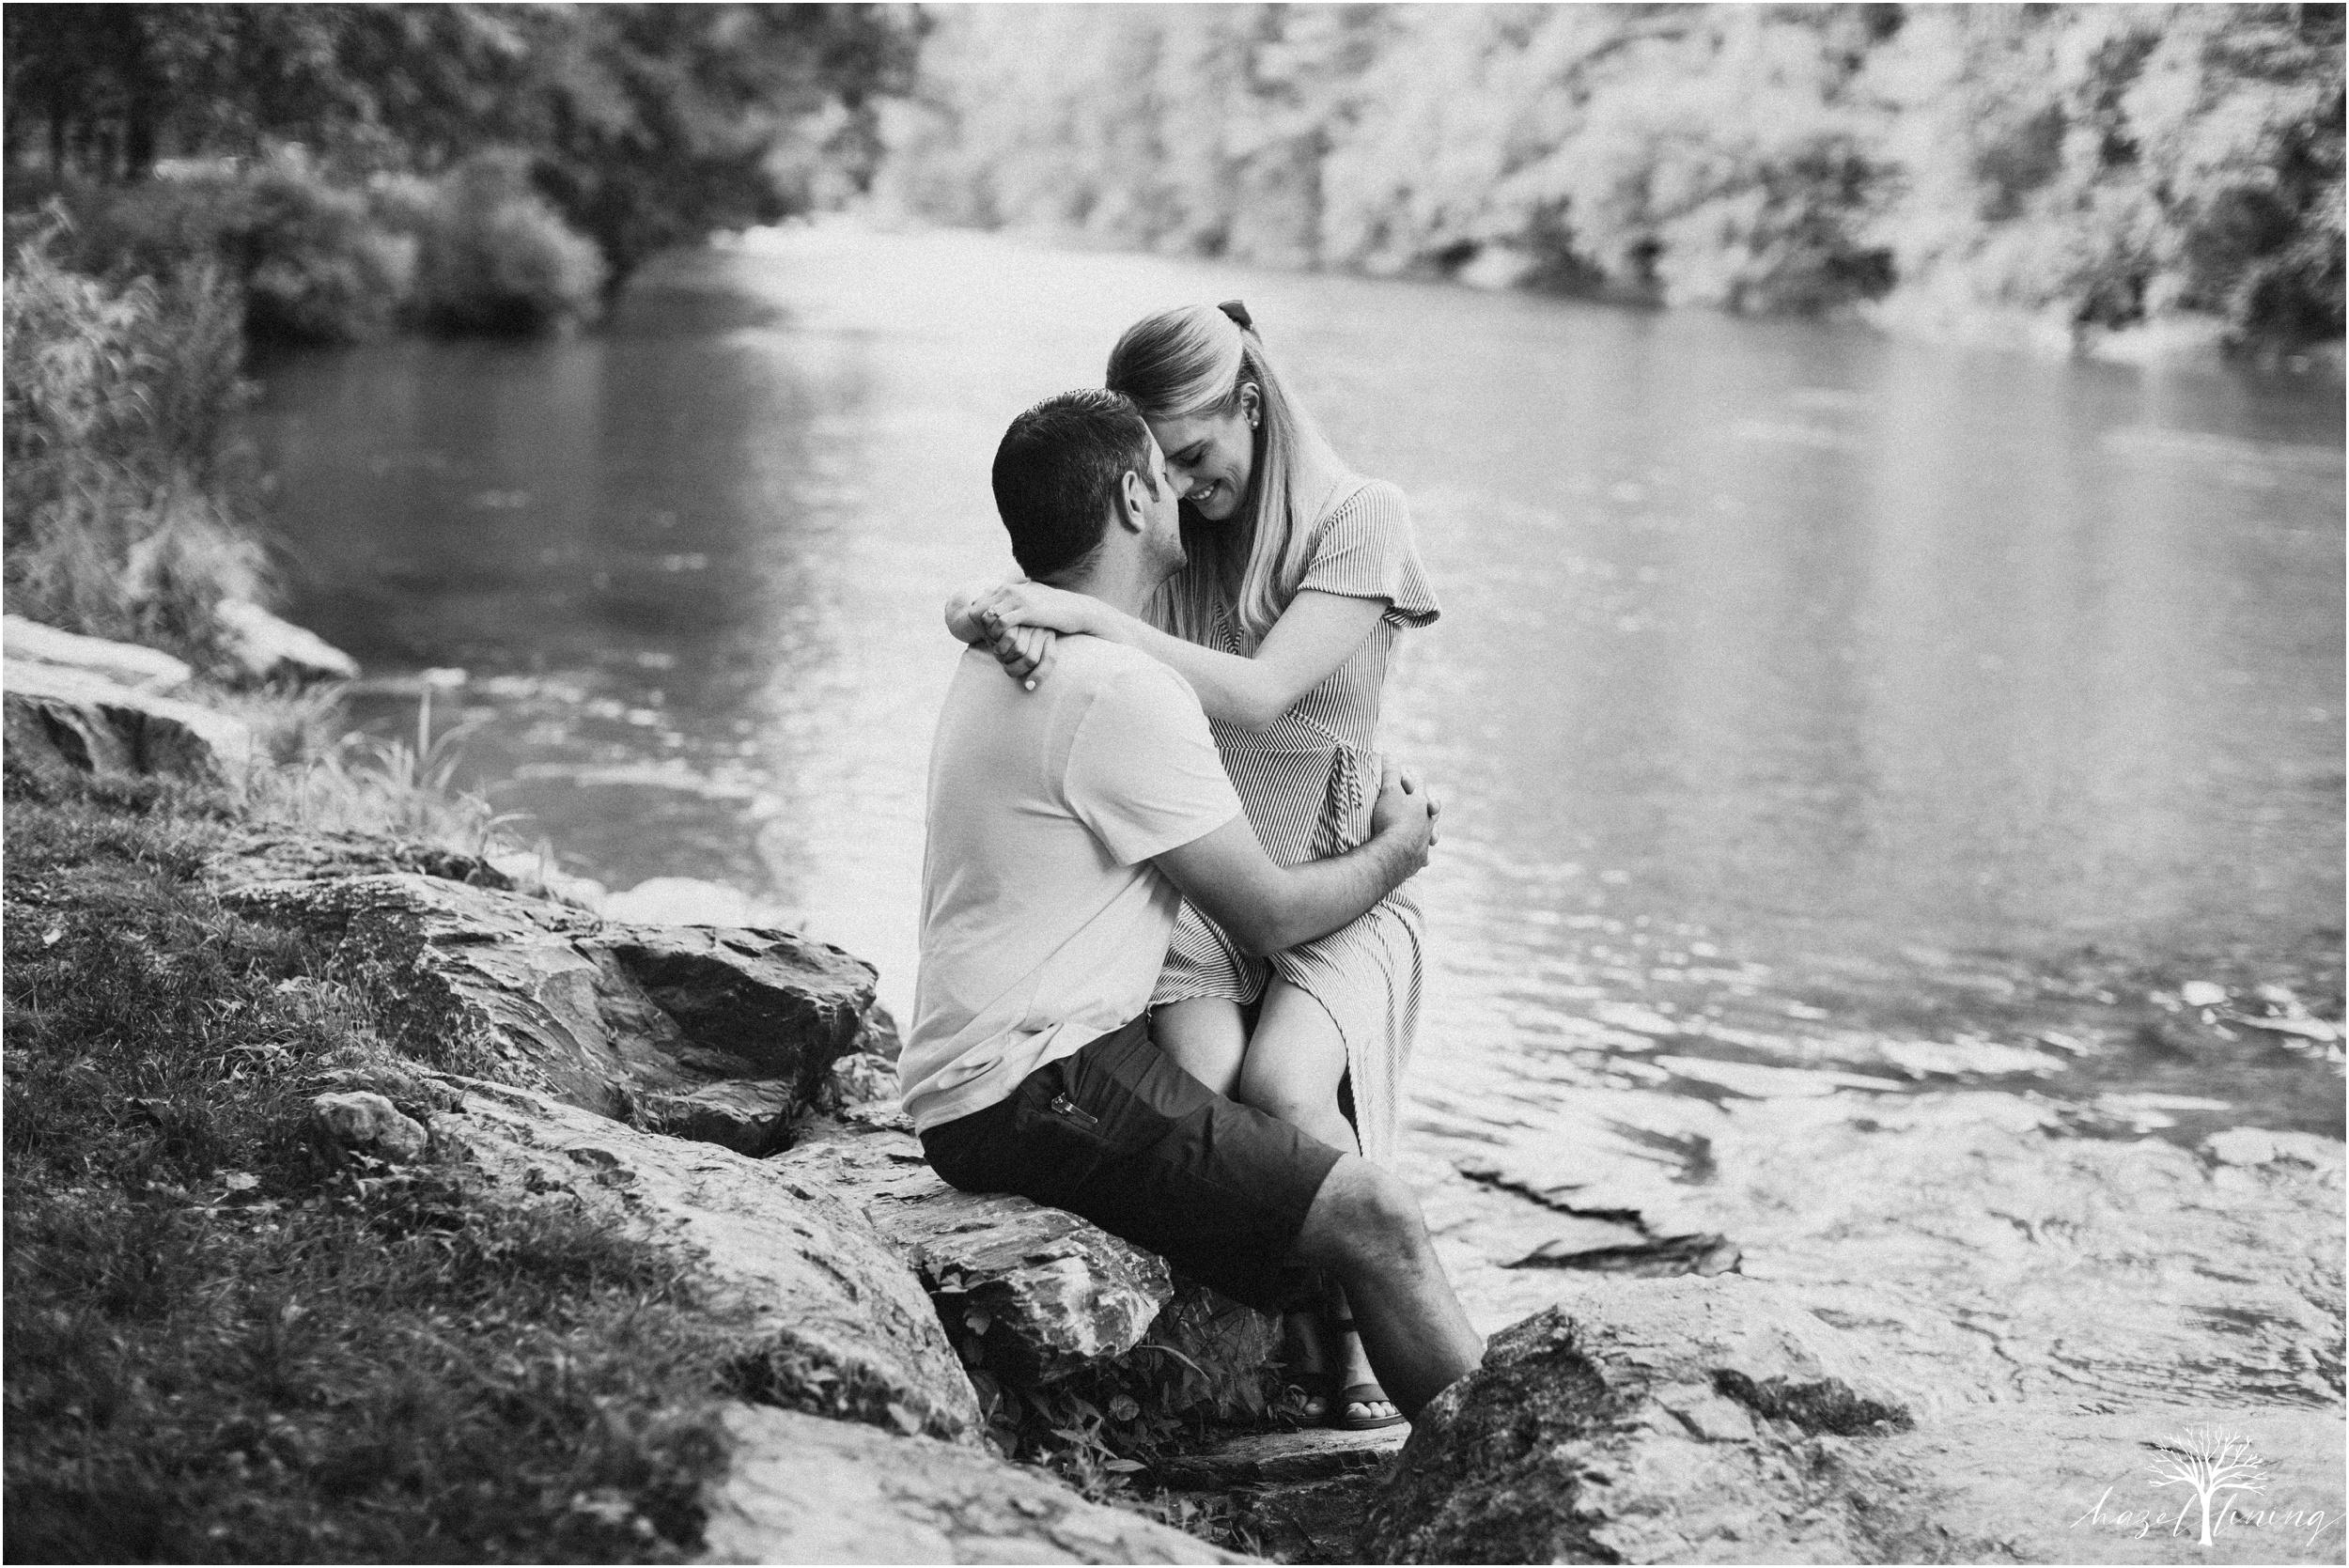 ashley-fillmore-steve-reimer-trexler-nature-preserve-summer-engagement-session-schnecksville-pennsylvania-hazel-lining-photography-destination-elopement-wedding-engagement-photography_0007.jpg